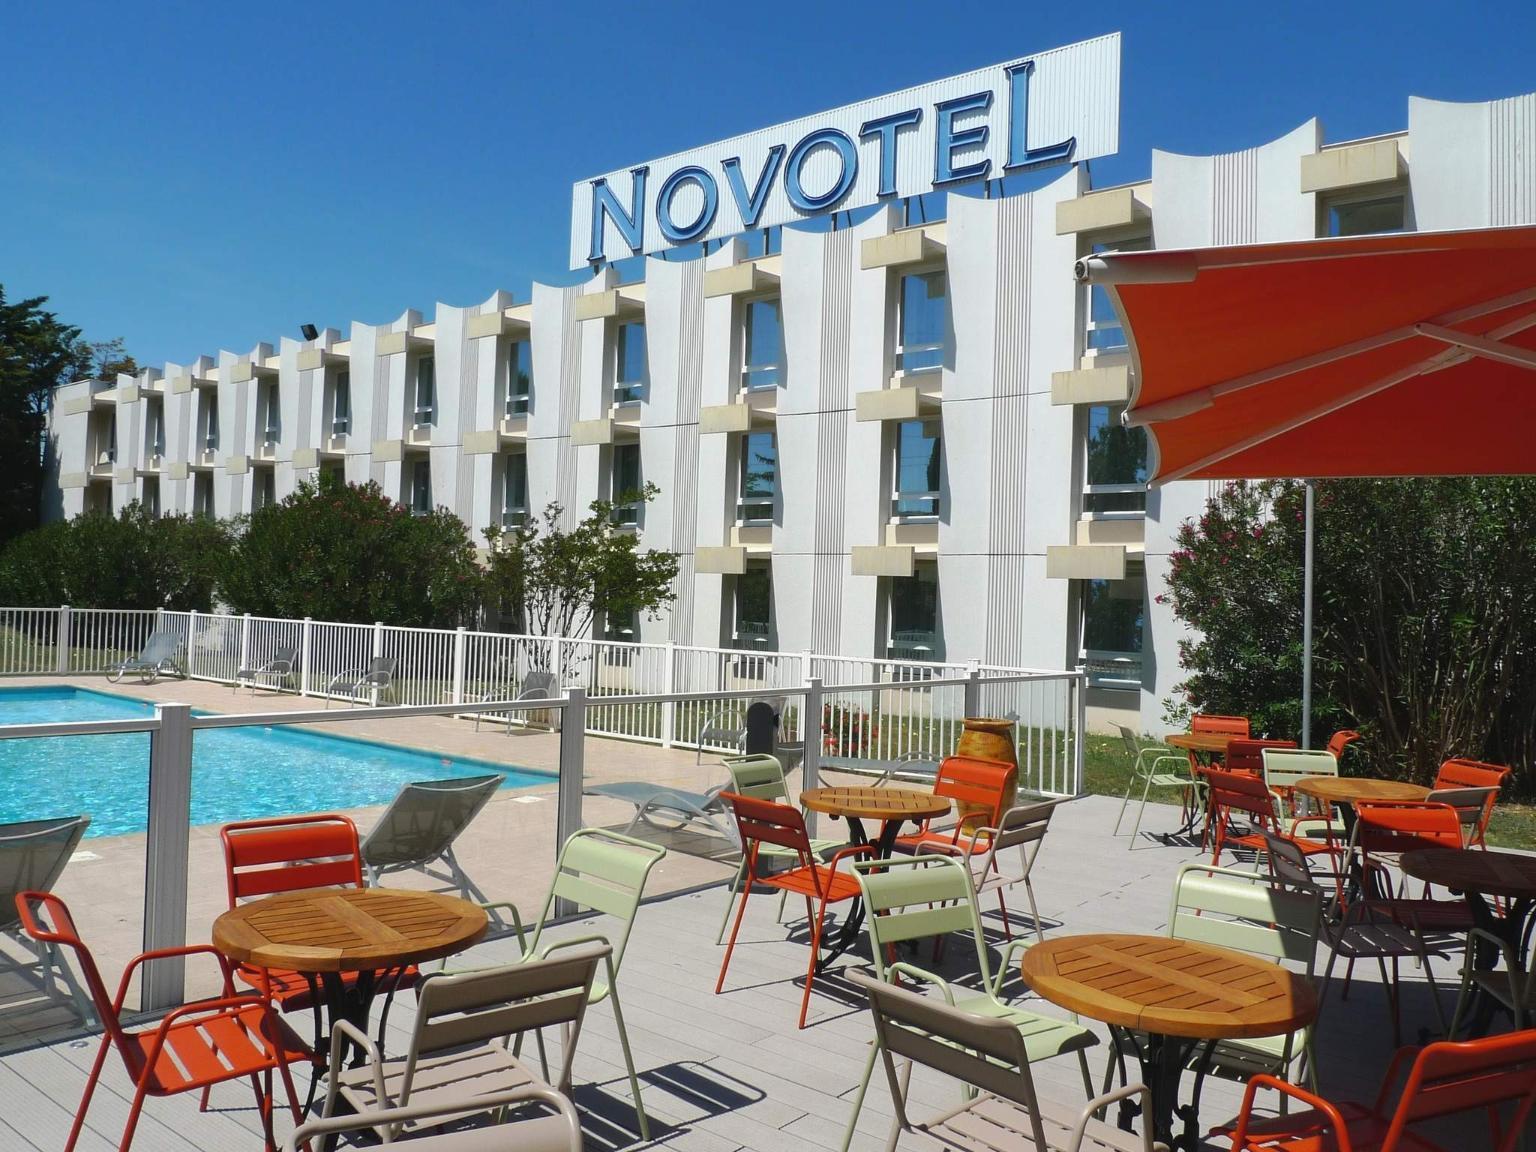 Narbonne Hotel Piscine